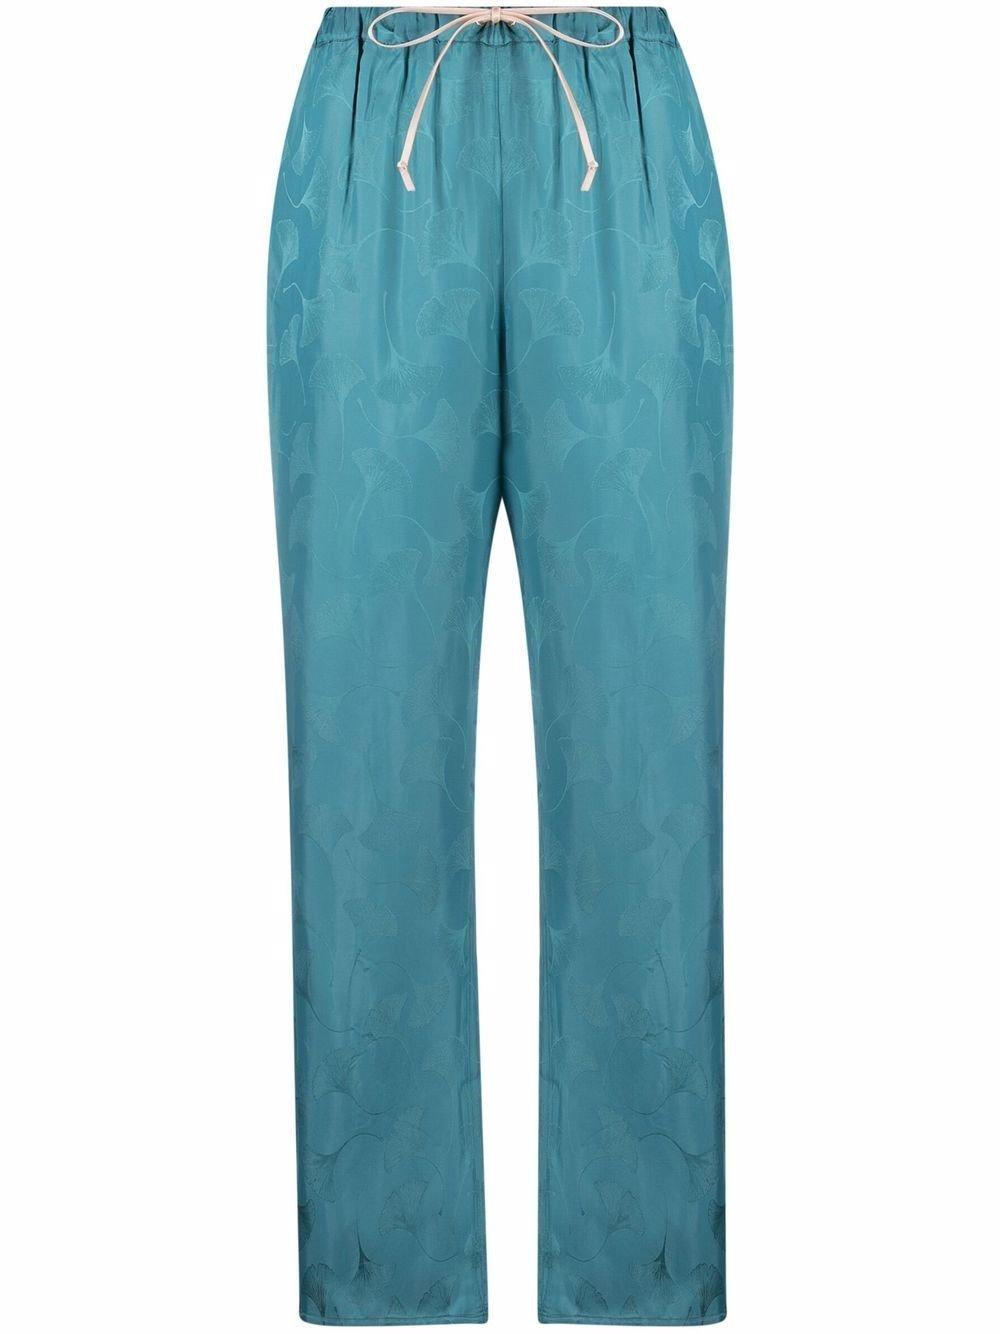 Viscose Jacquard Pants